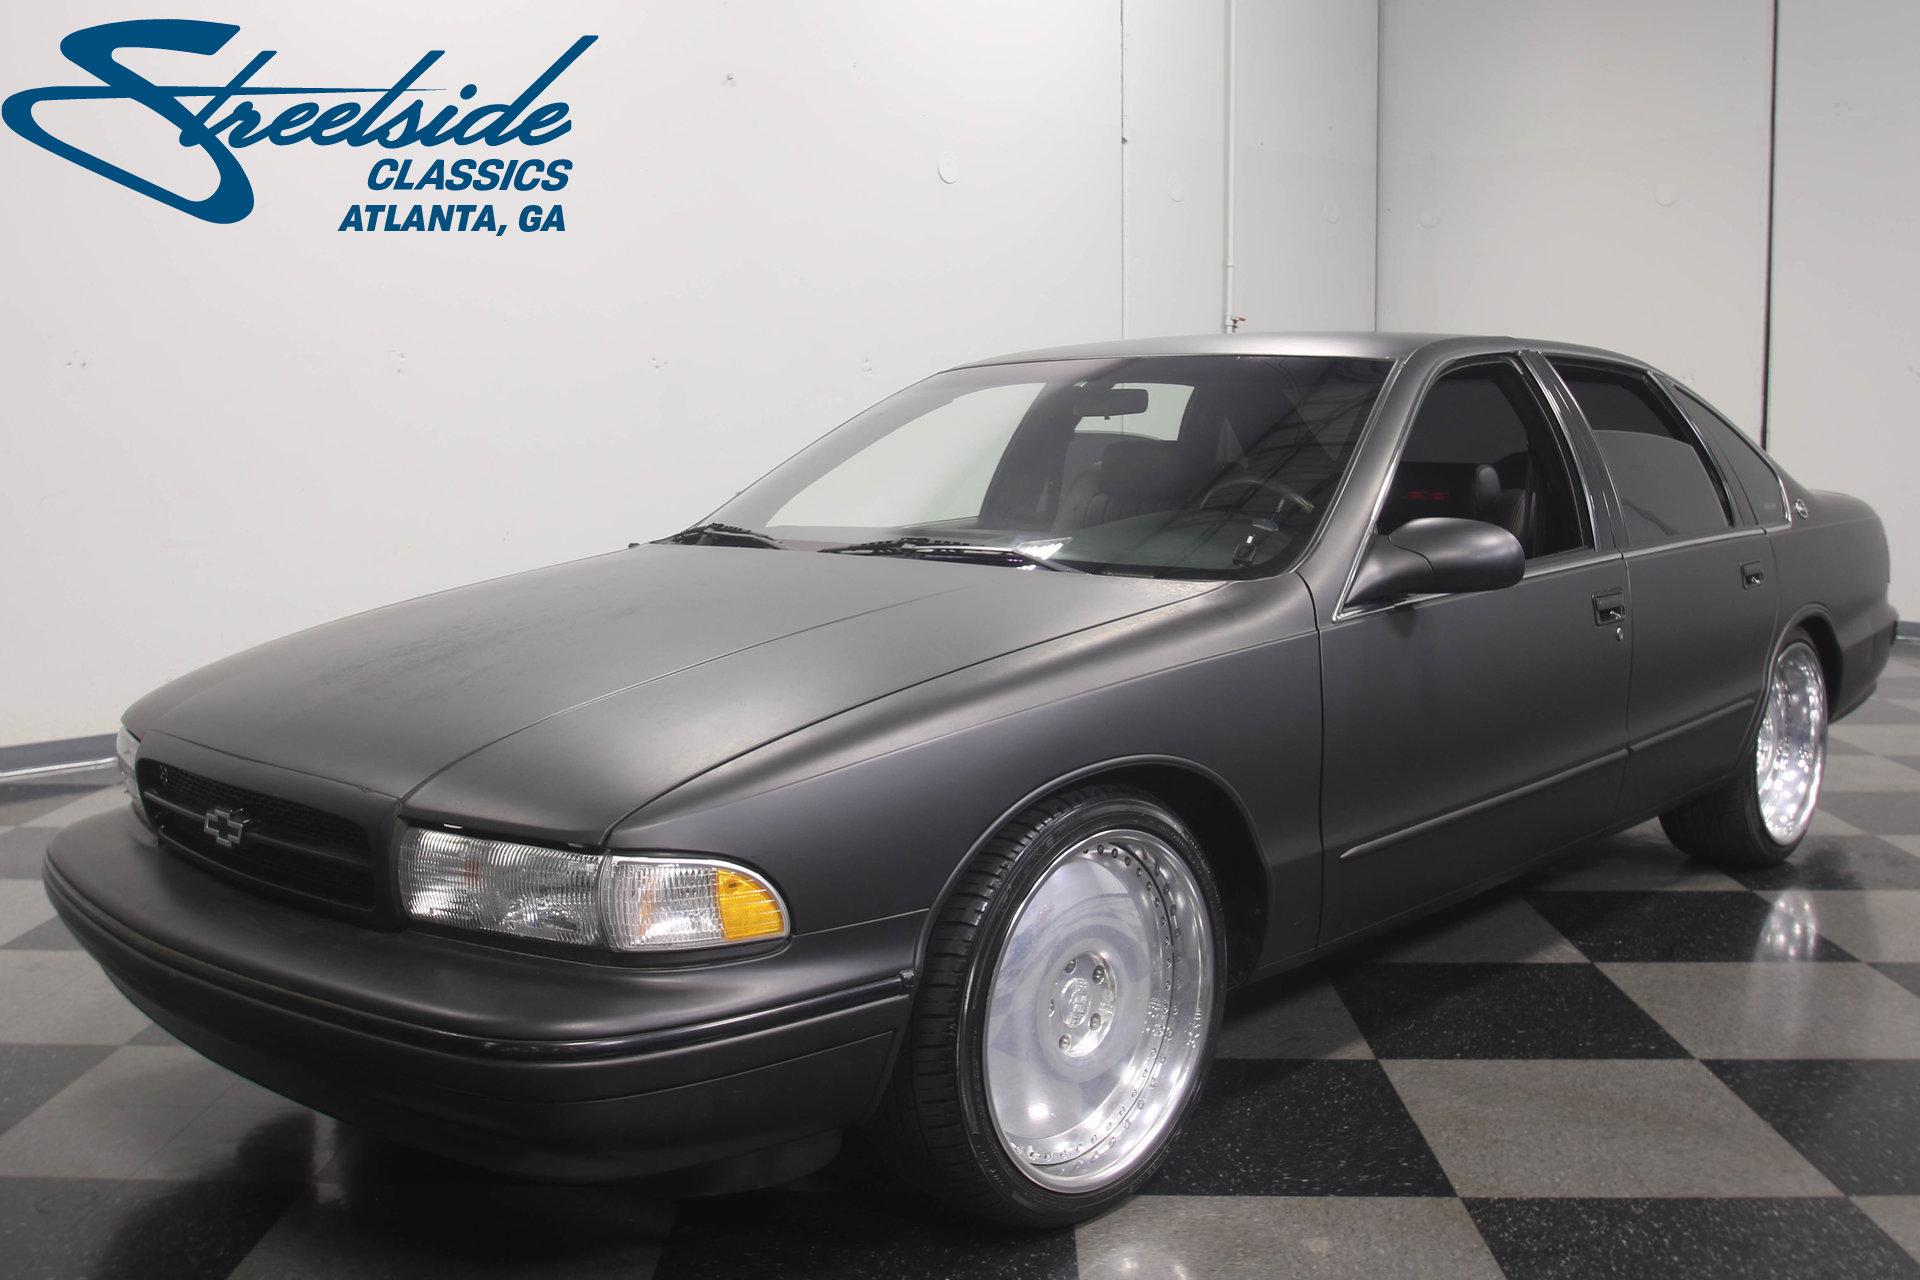 1996 chevrolet impala streetside classics the nation 39 s trusted classic car consignment dealer. Black Bedroom Furniture Sets. Home Design Ideas